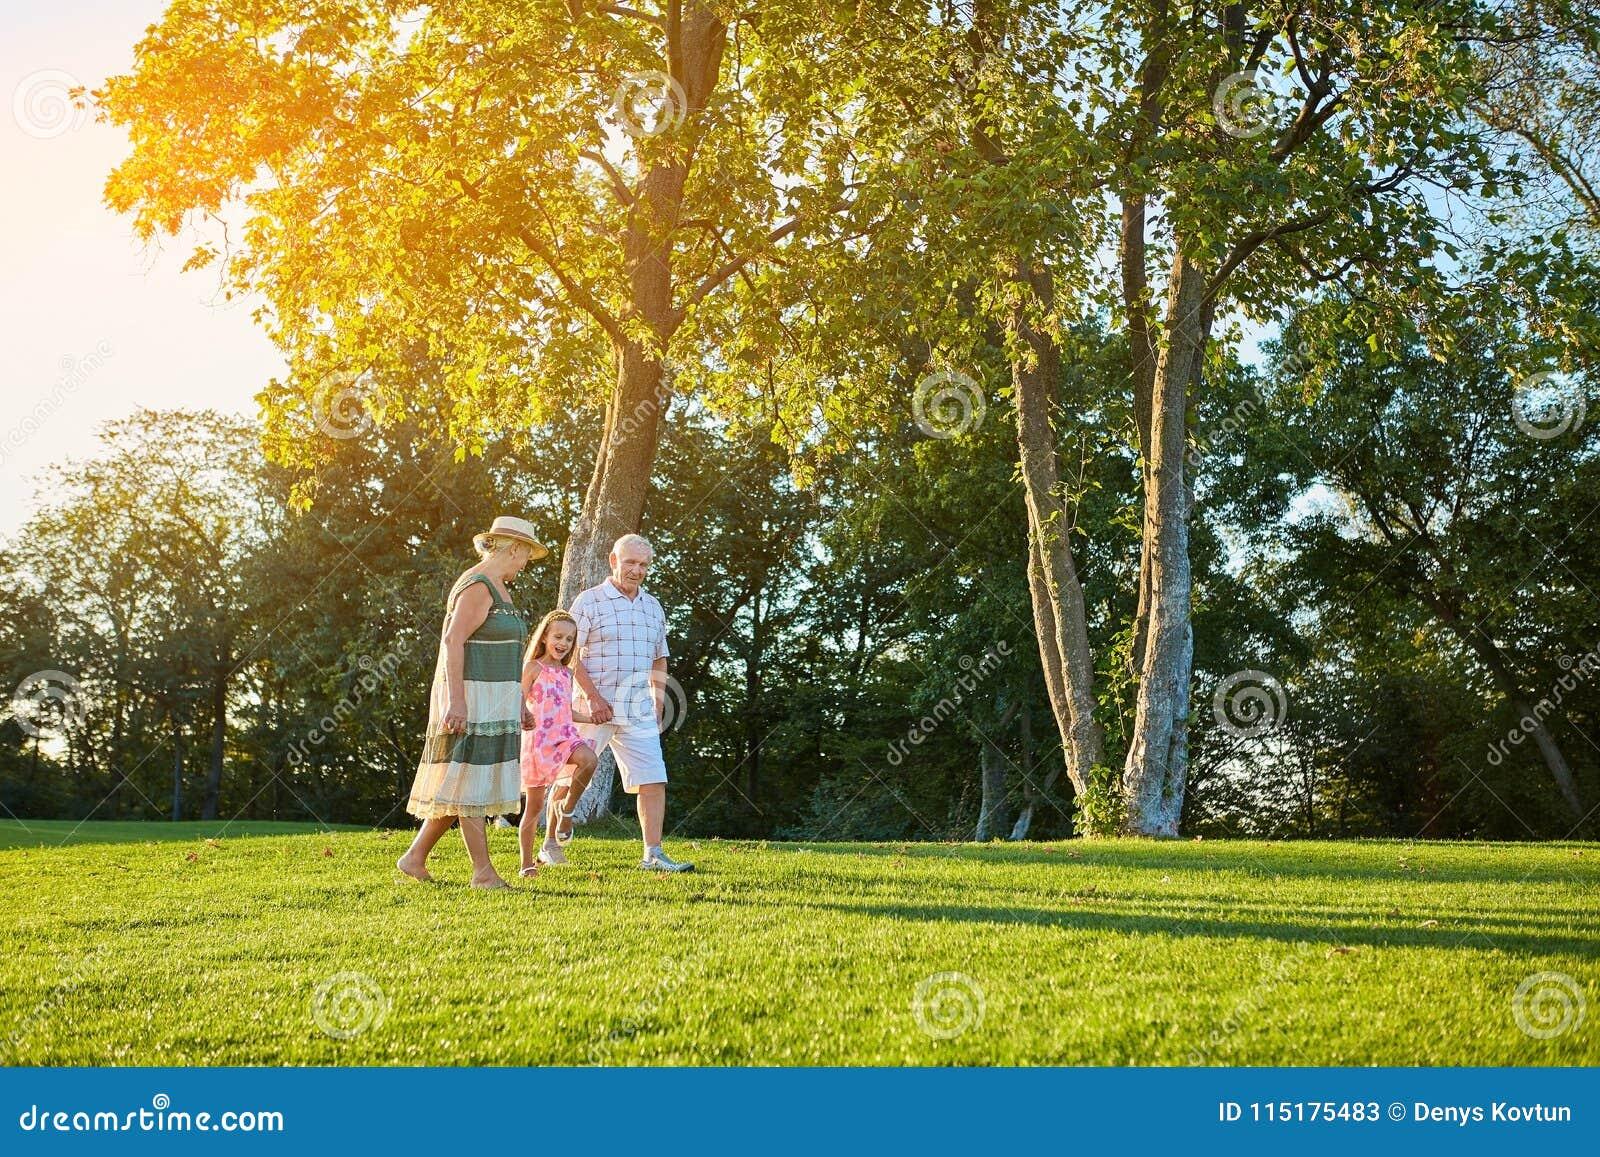 Seniors with grandchild walking outdoors.